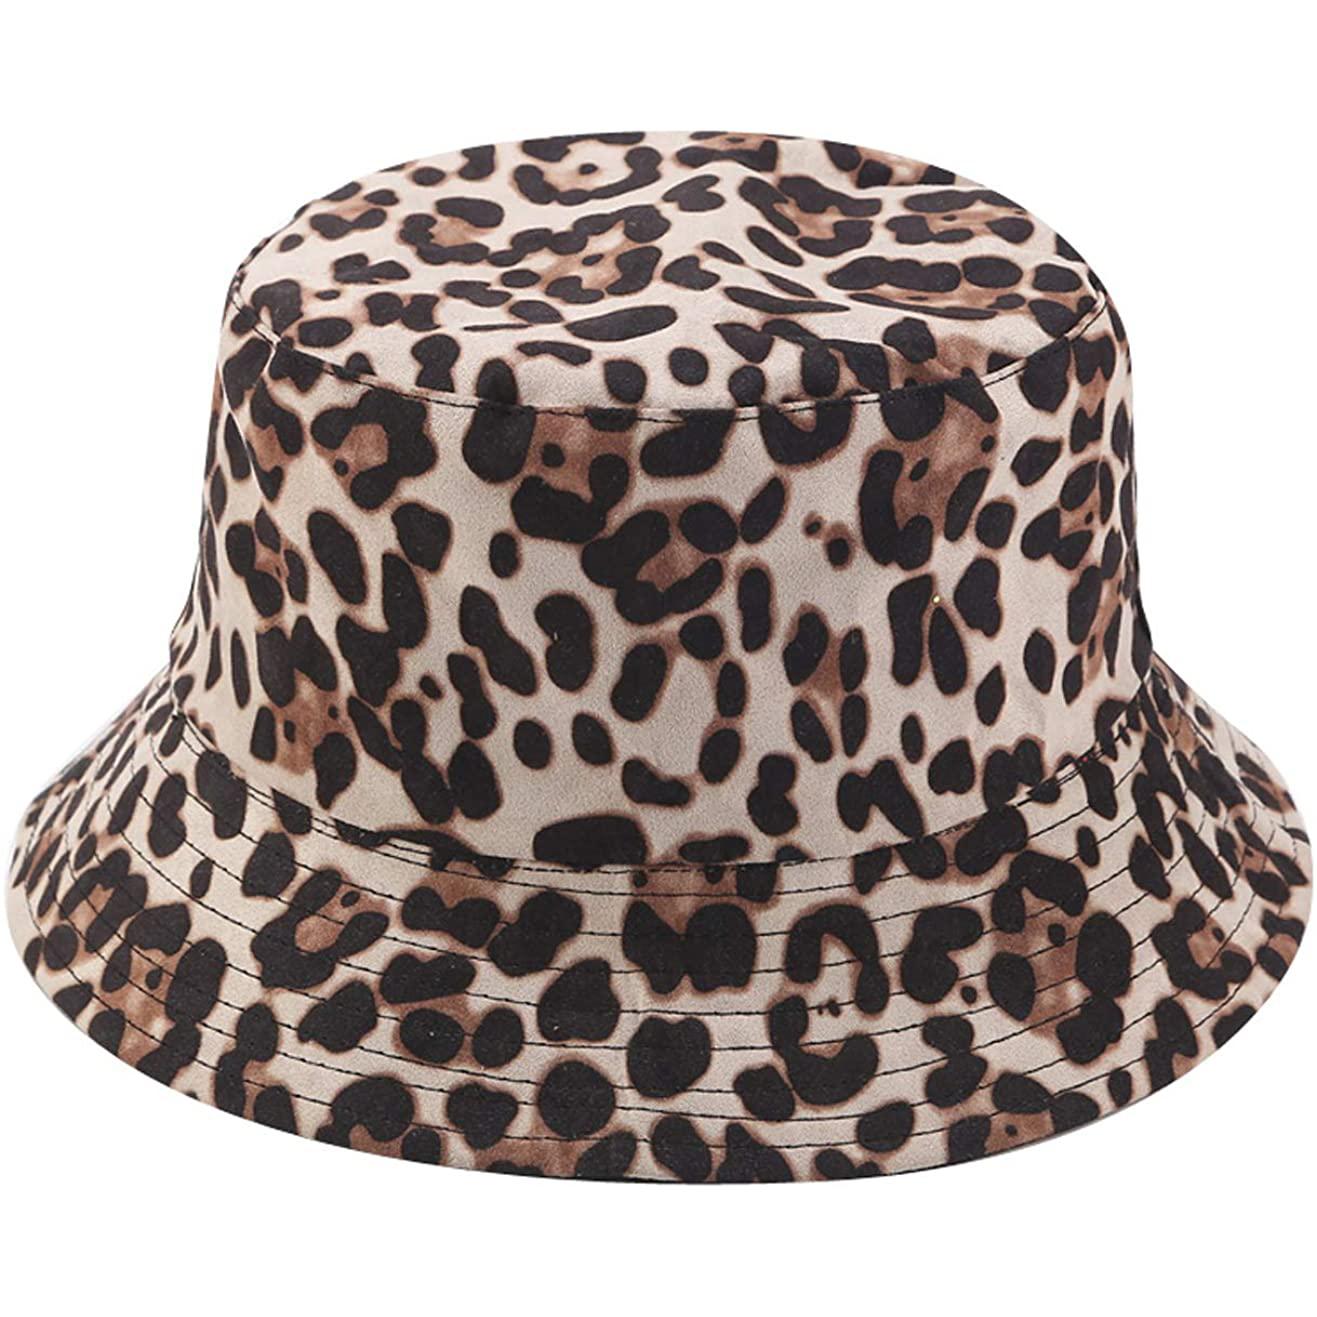 Joylife Leopard Print Bucket Hat